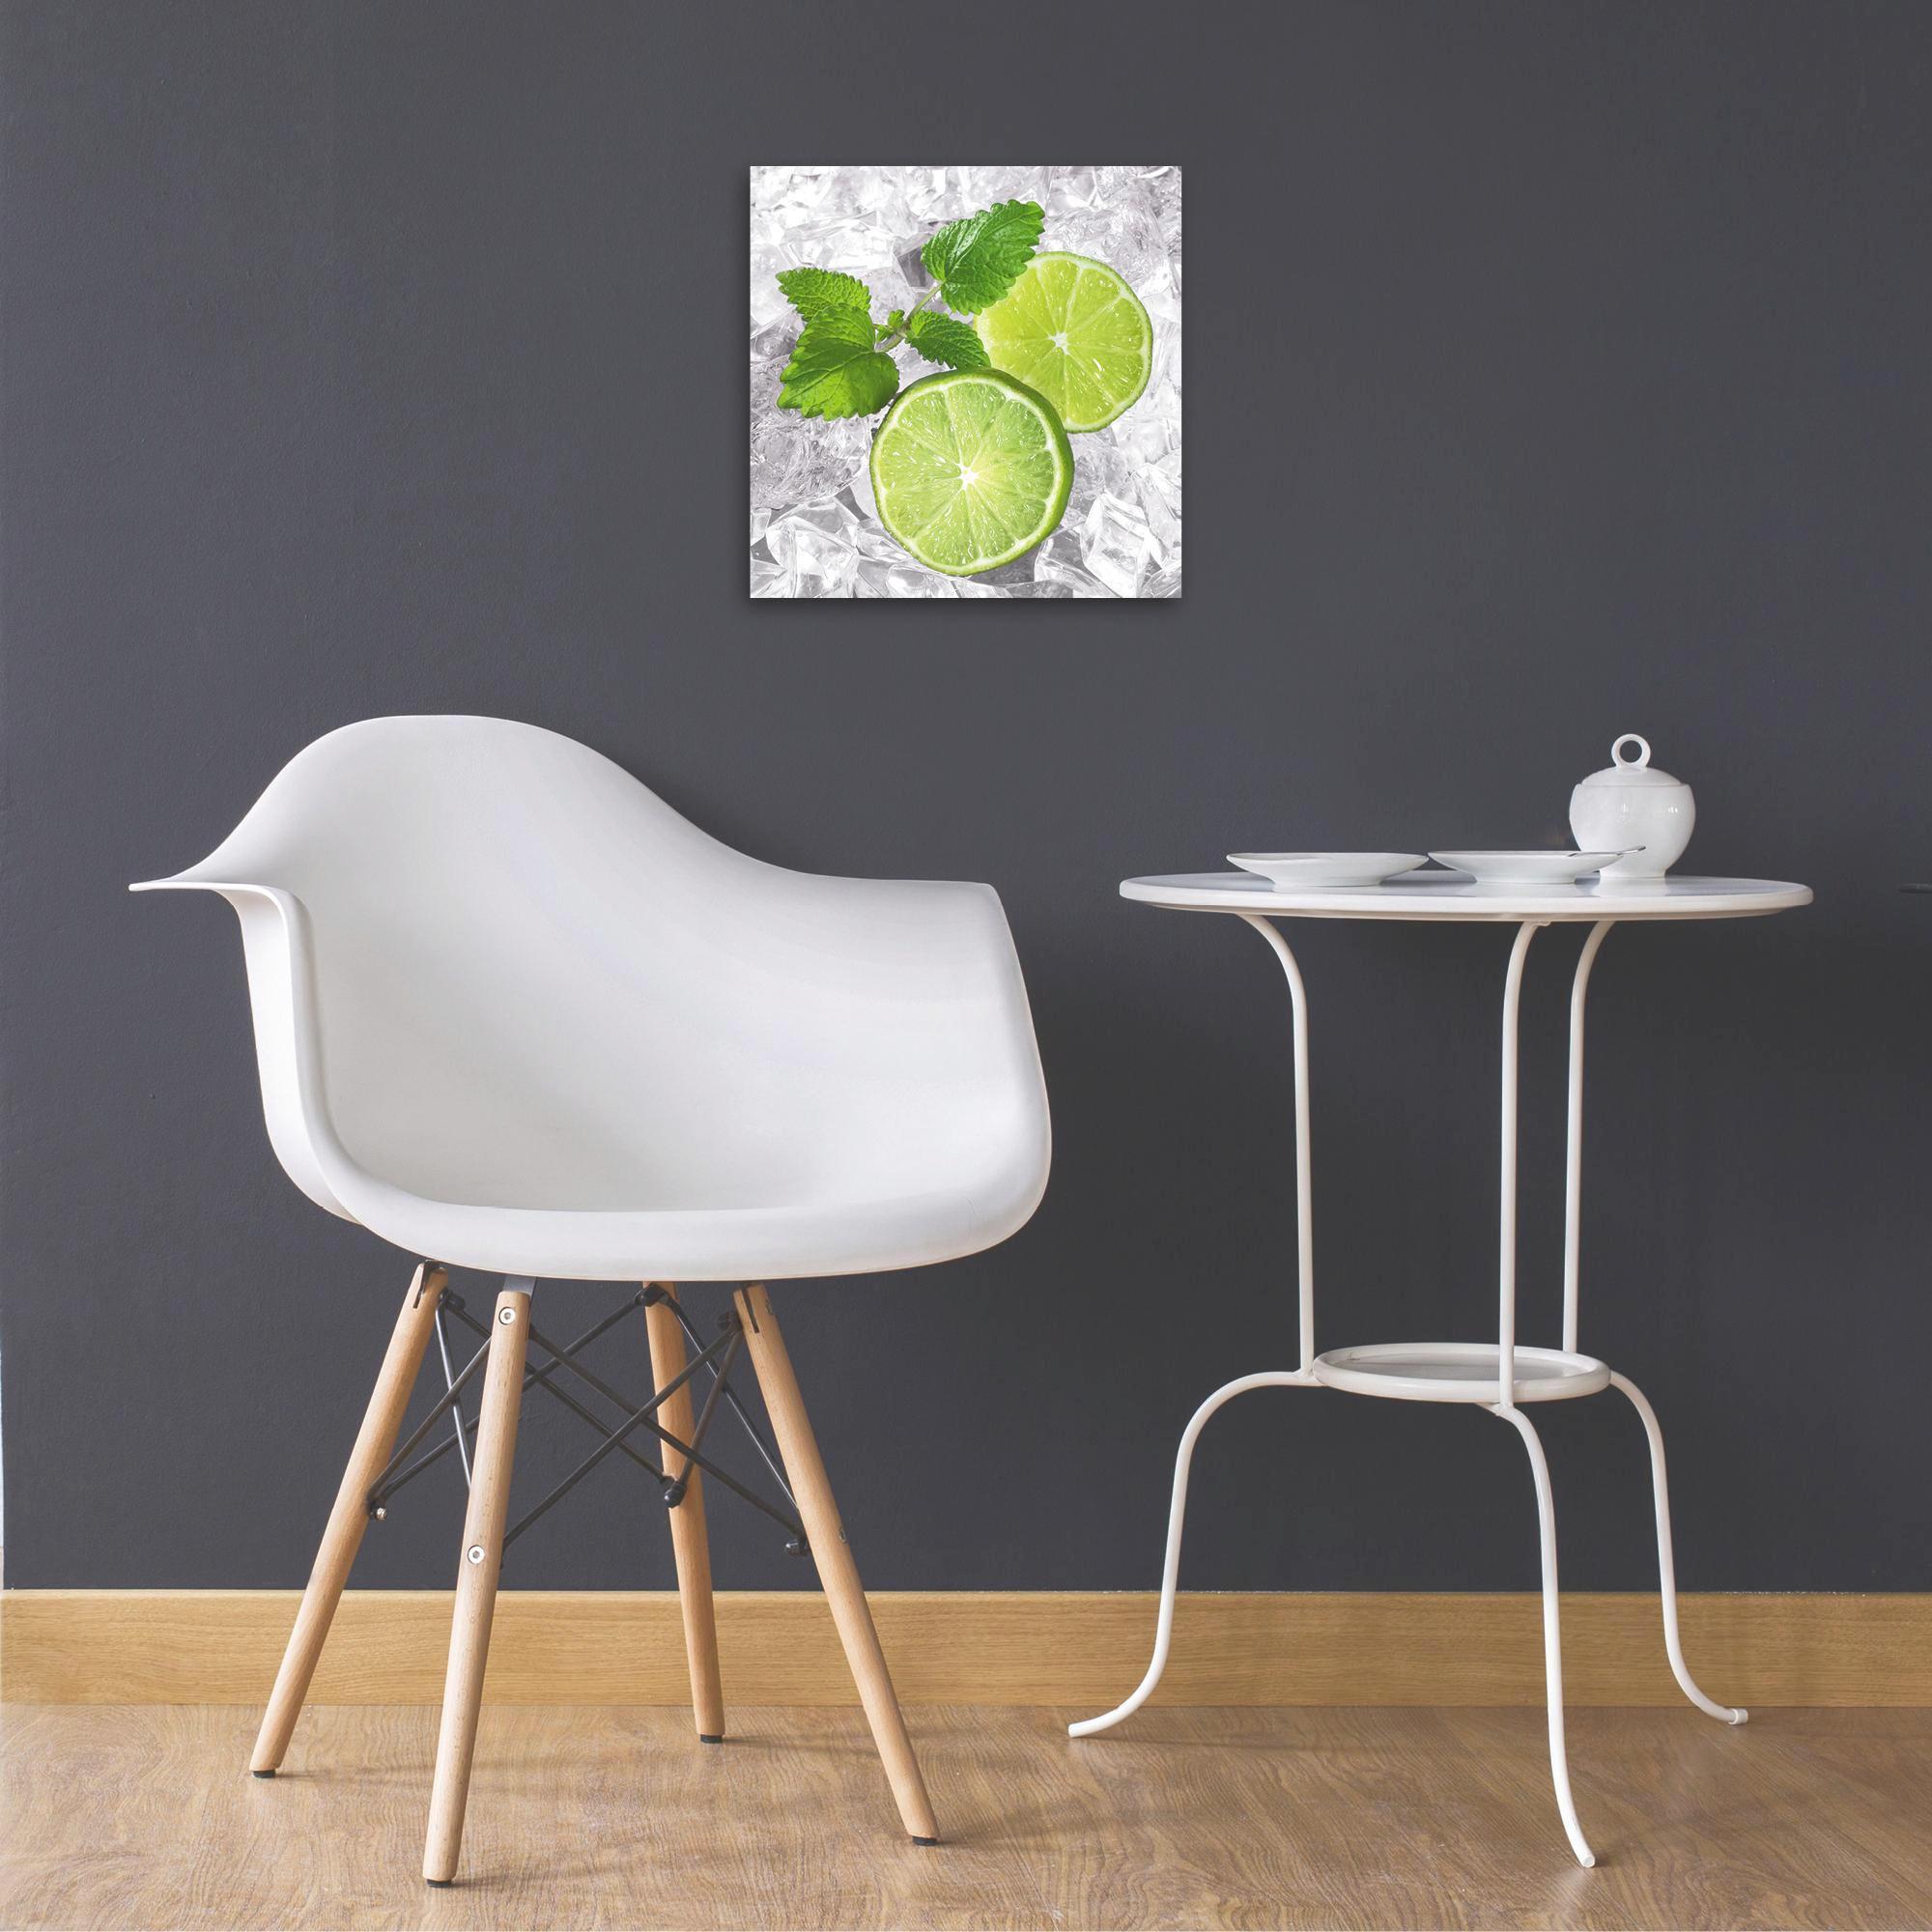 "Eiswürfel, Essen & Trinken Glasbild ""Lemon on ice"" - Multicolor, Basics, Glas (30/30cm) - EUROGRAPHICS"